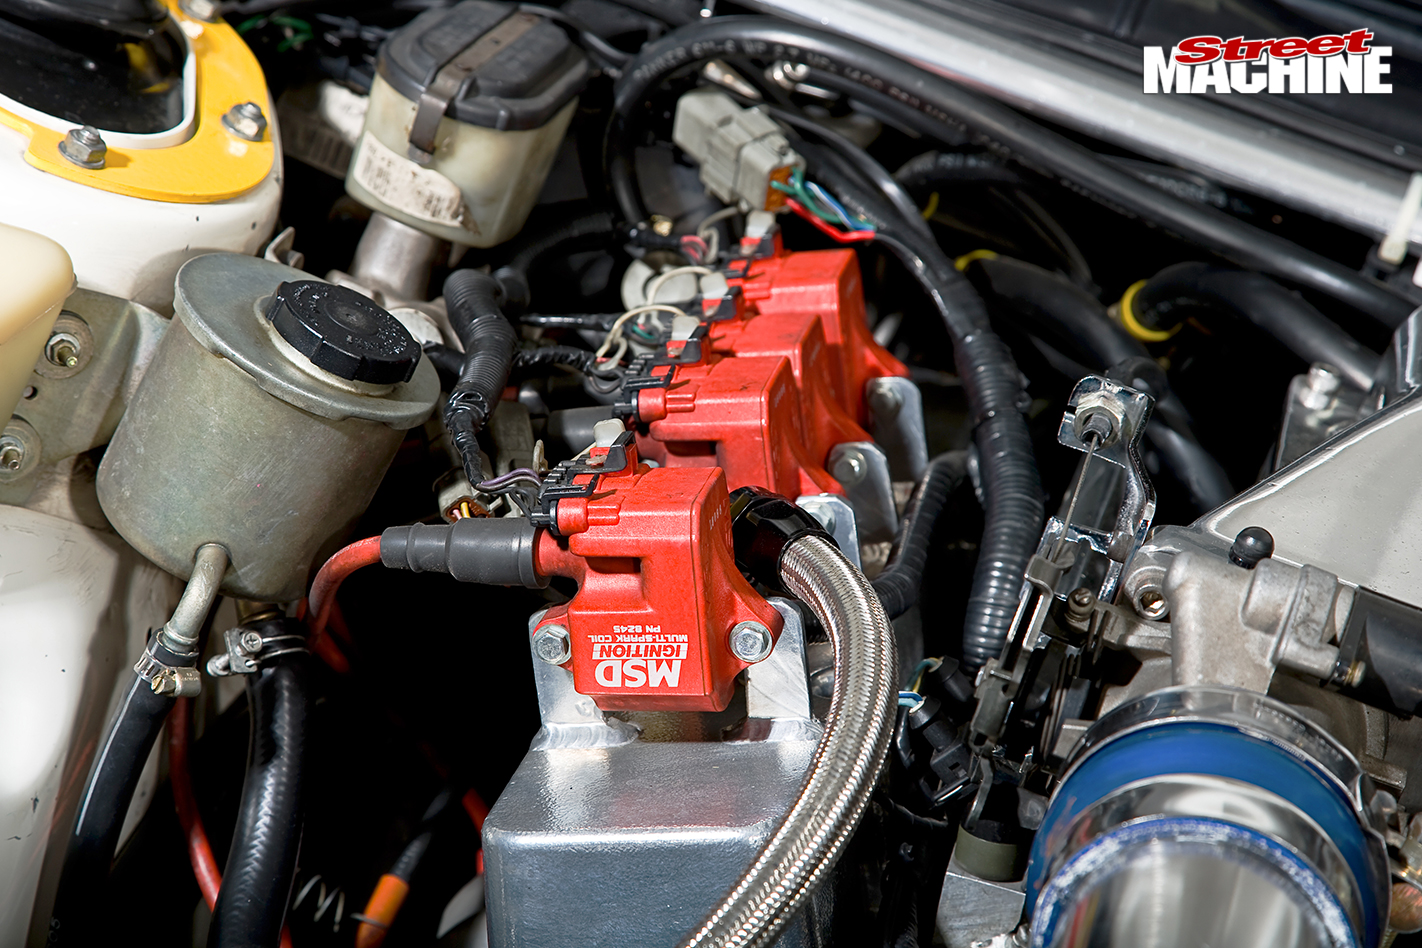 Holden -vr -commodore -ute -engine -3